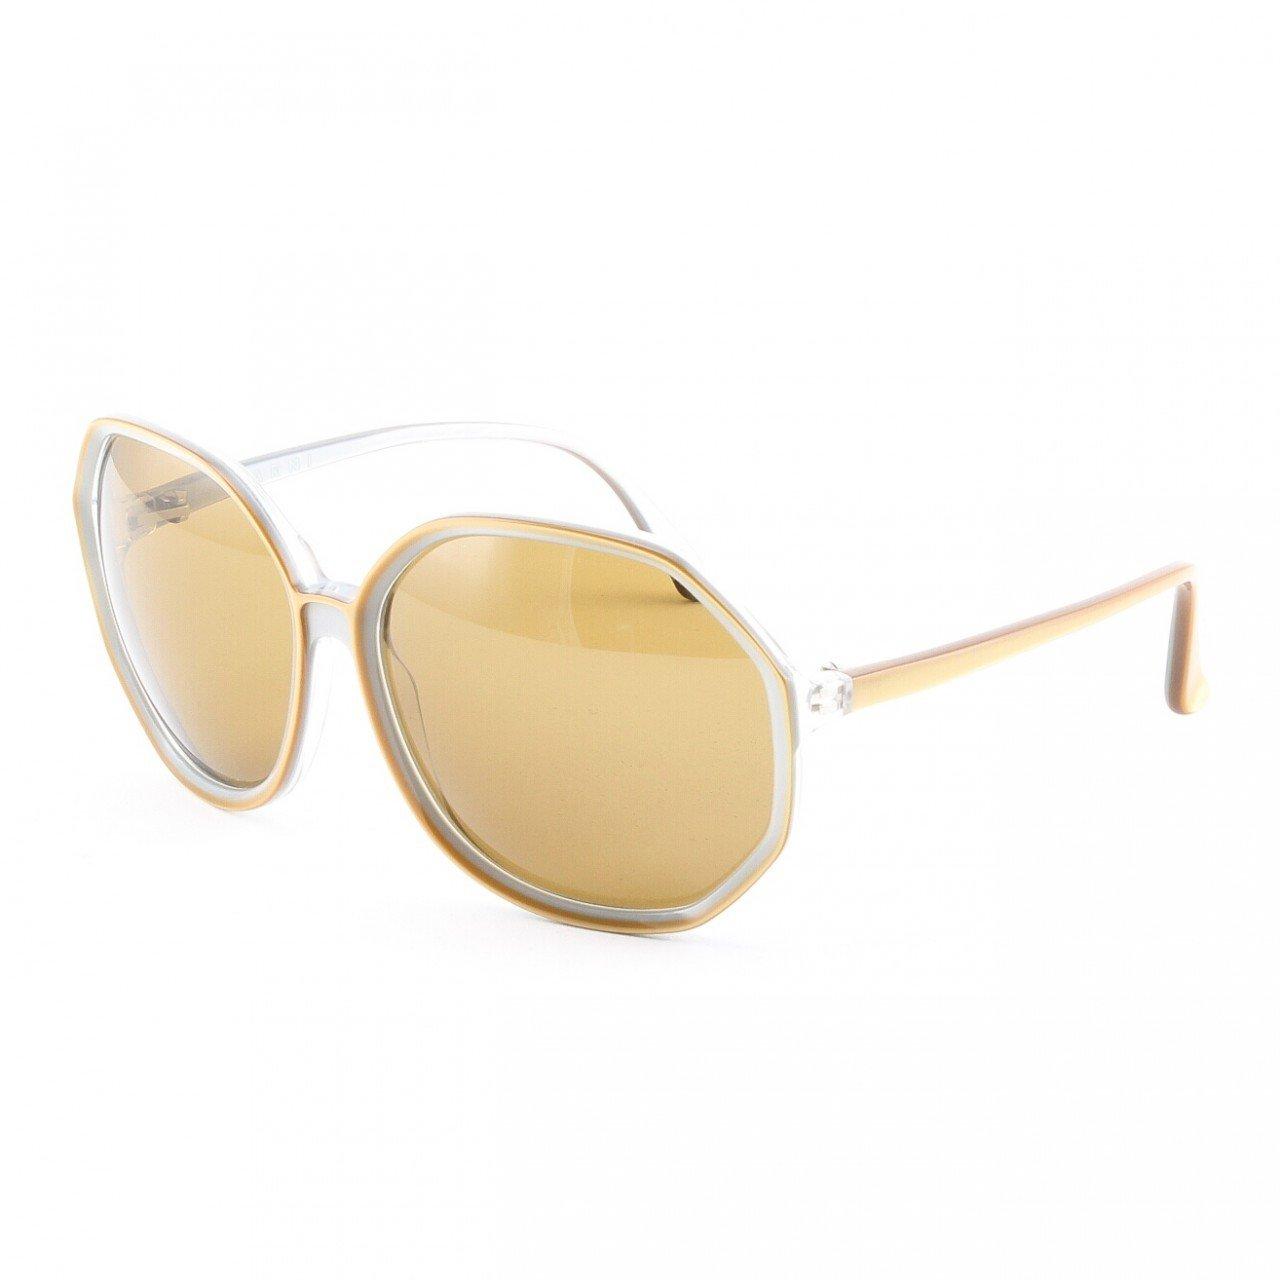 Marni MA181S Sunglasses 09 Burnished Gold Frame, Brown Gradient Lenses